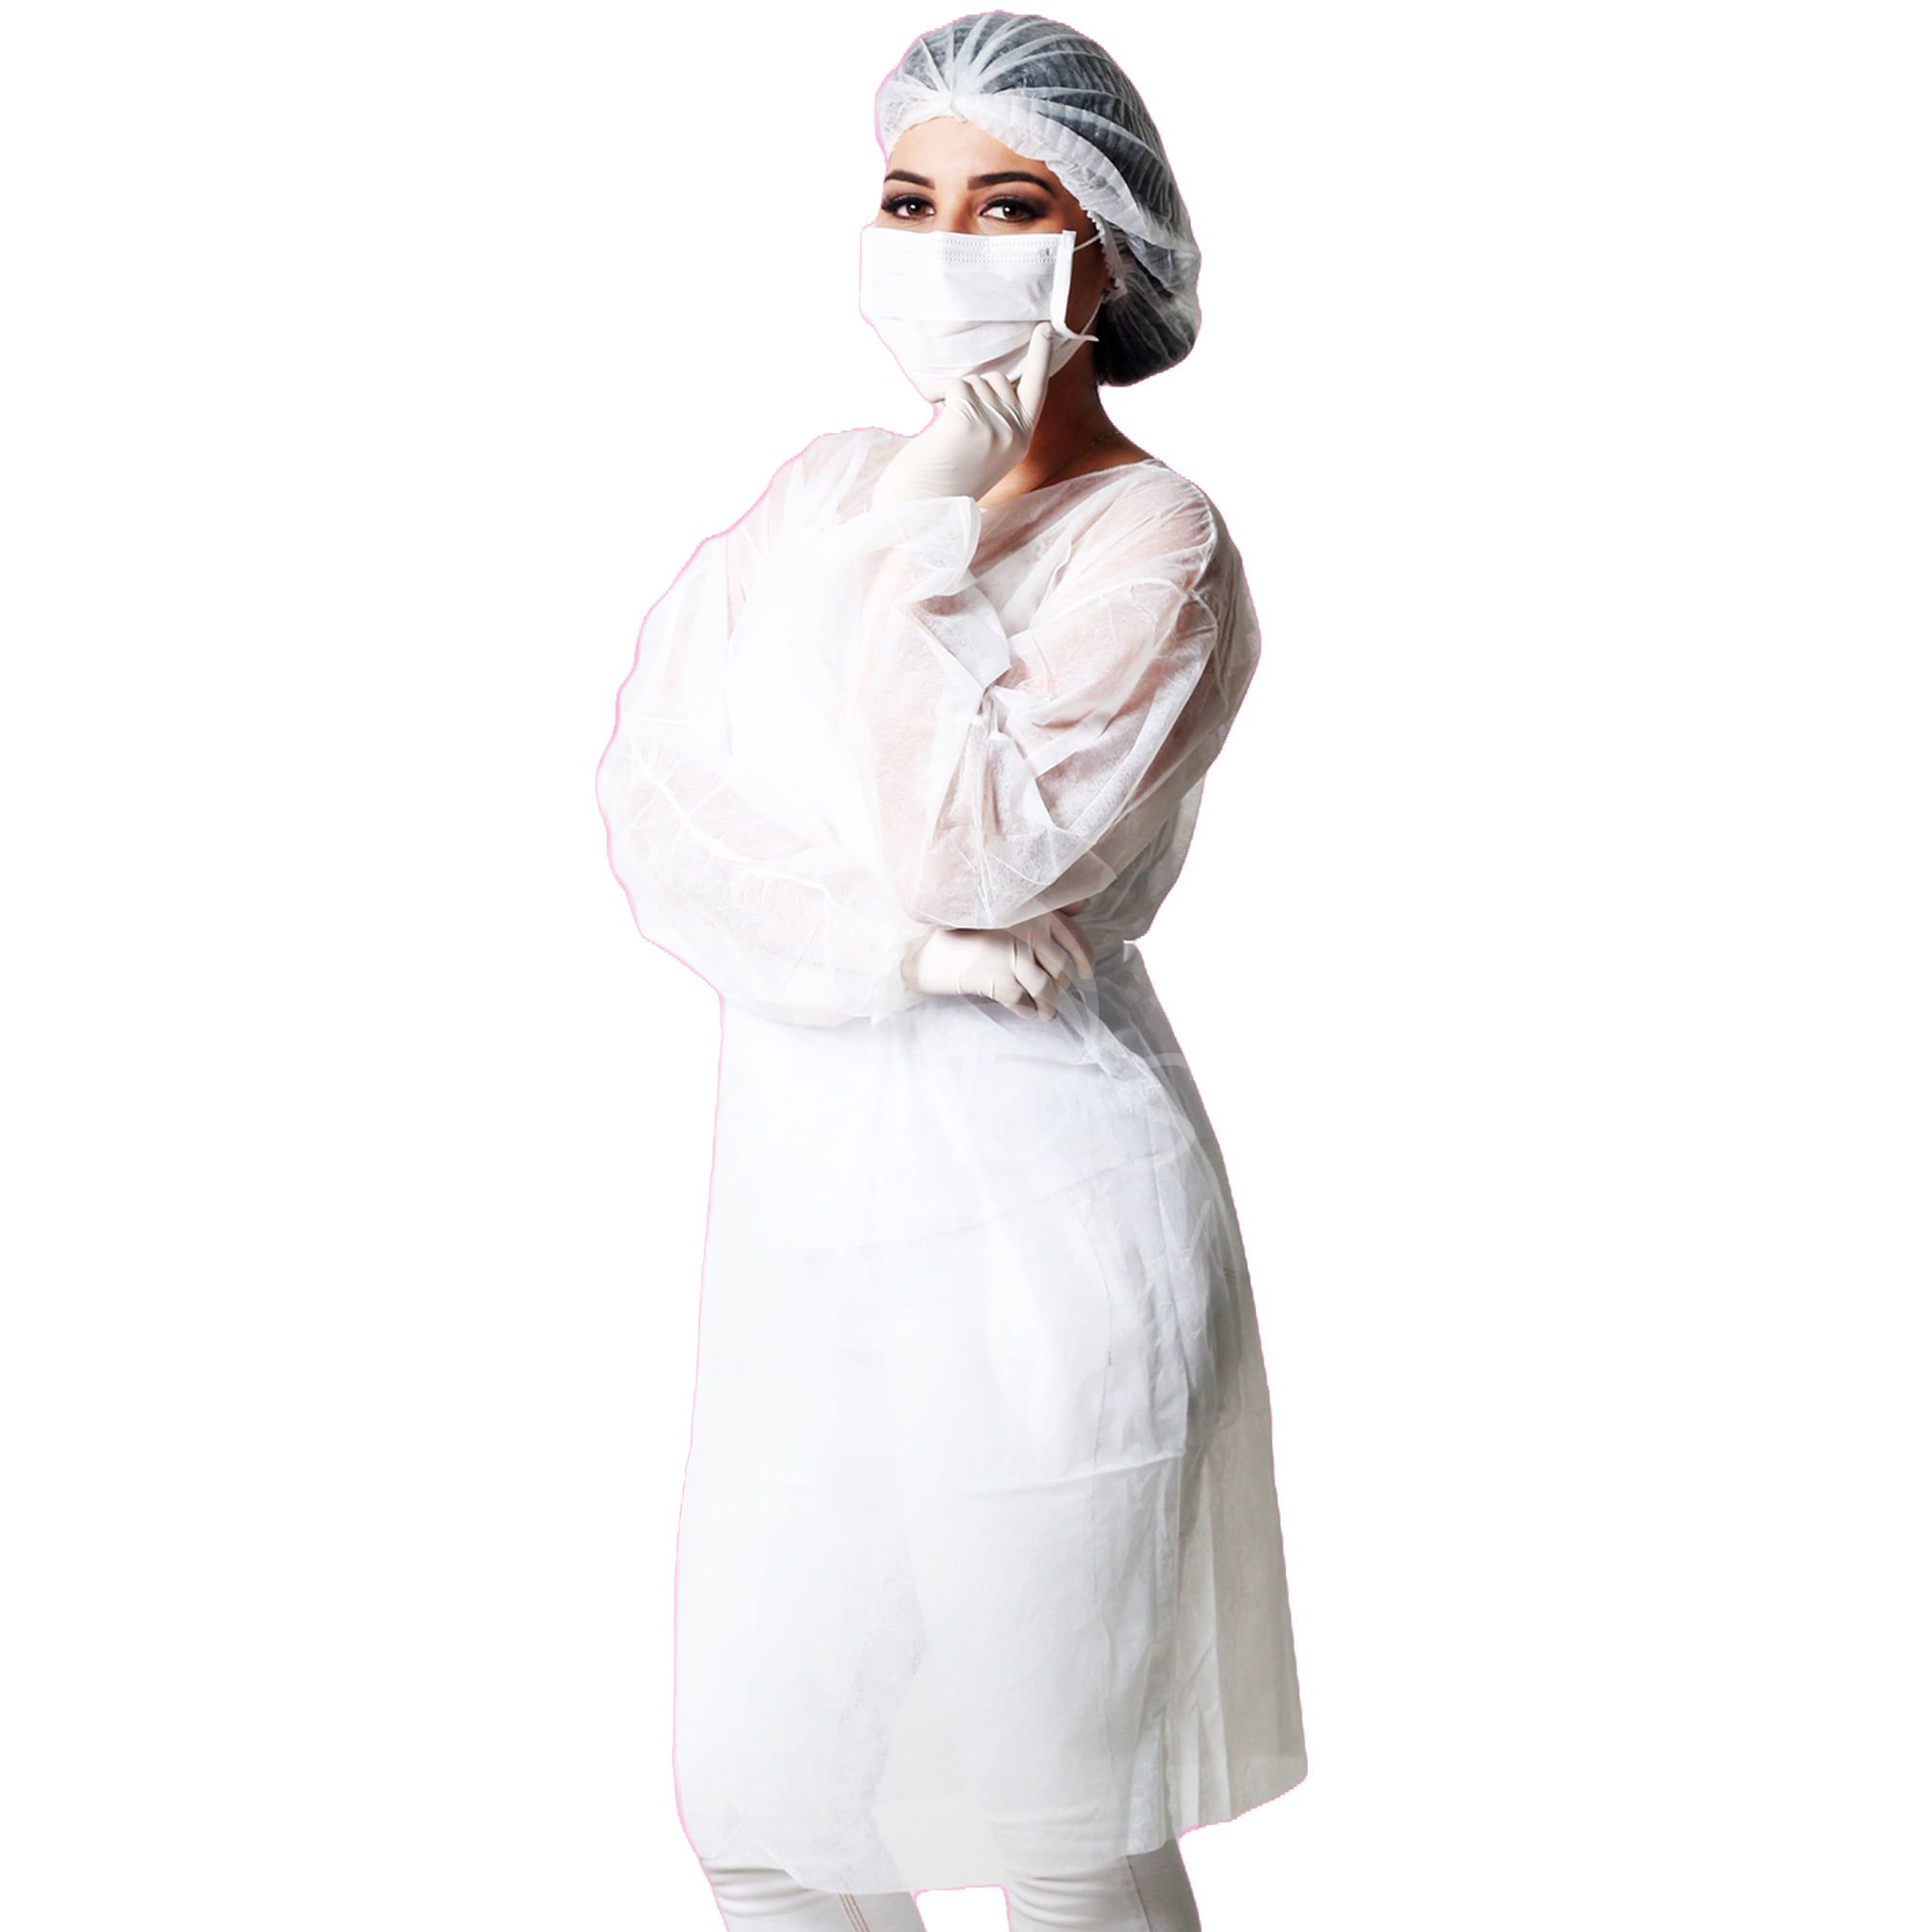 Avental Descartável TNT Branco Maga Longa - 20g